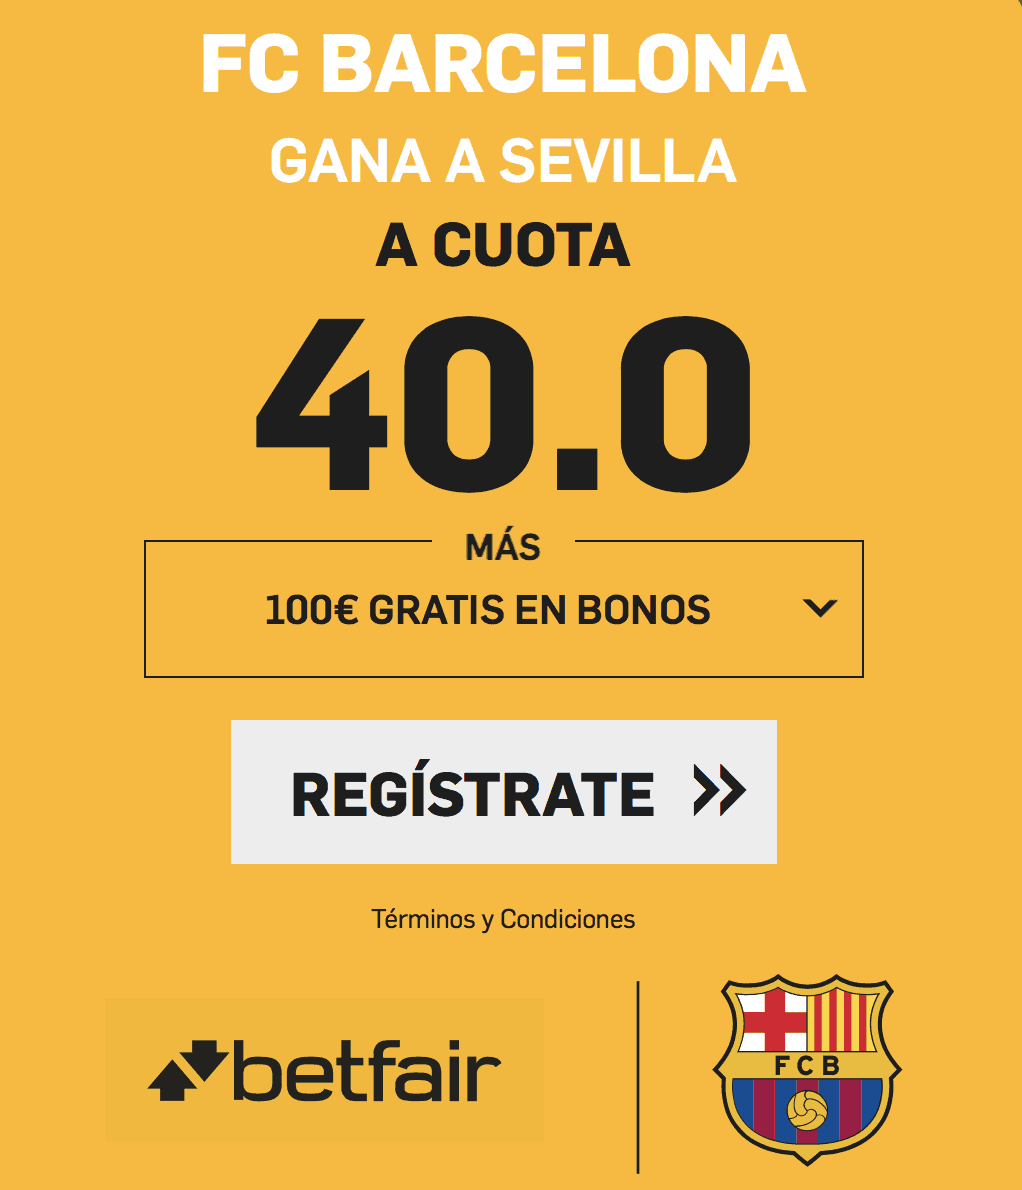 Supercuotas betfair FC Barcelona - Sevilla